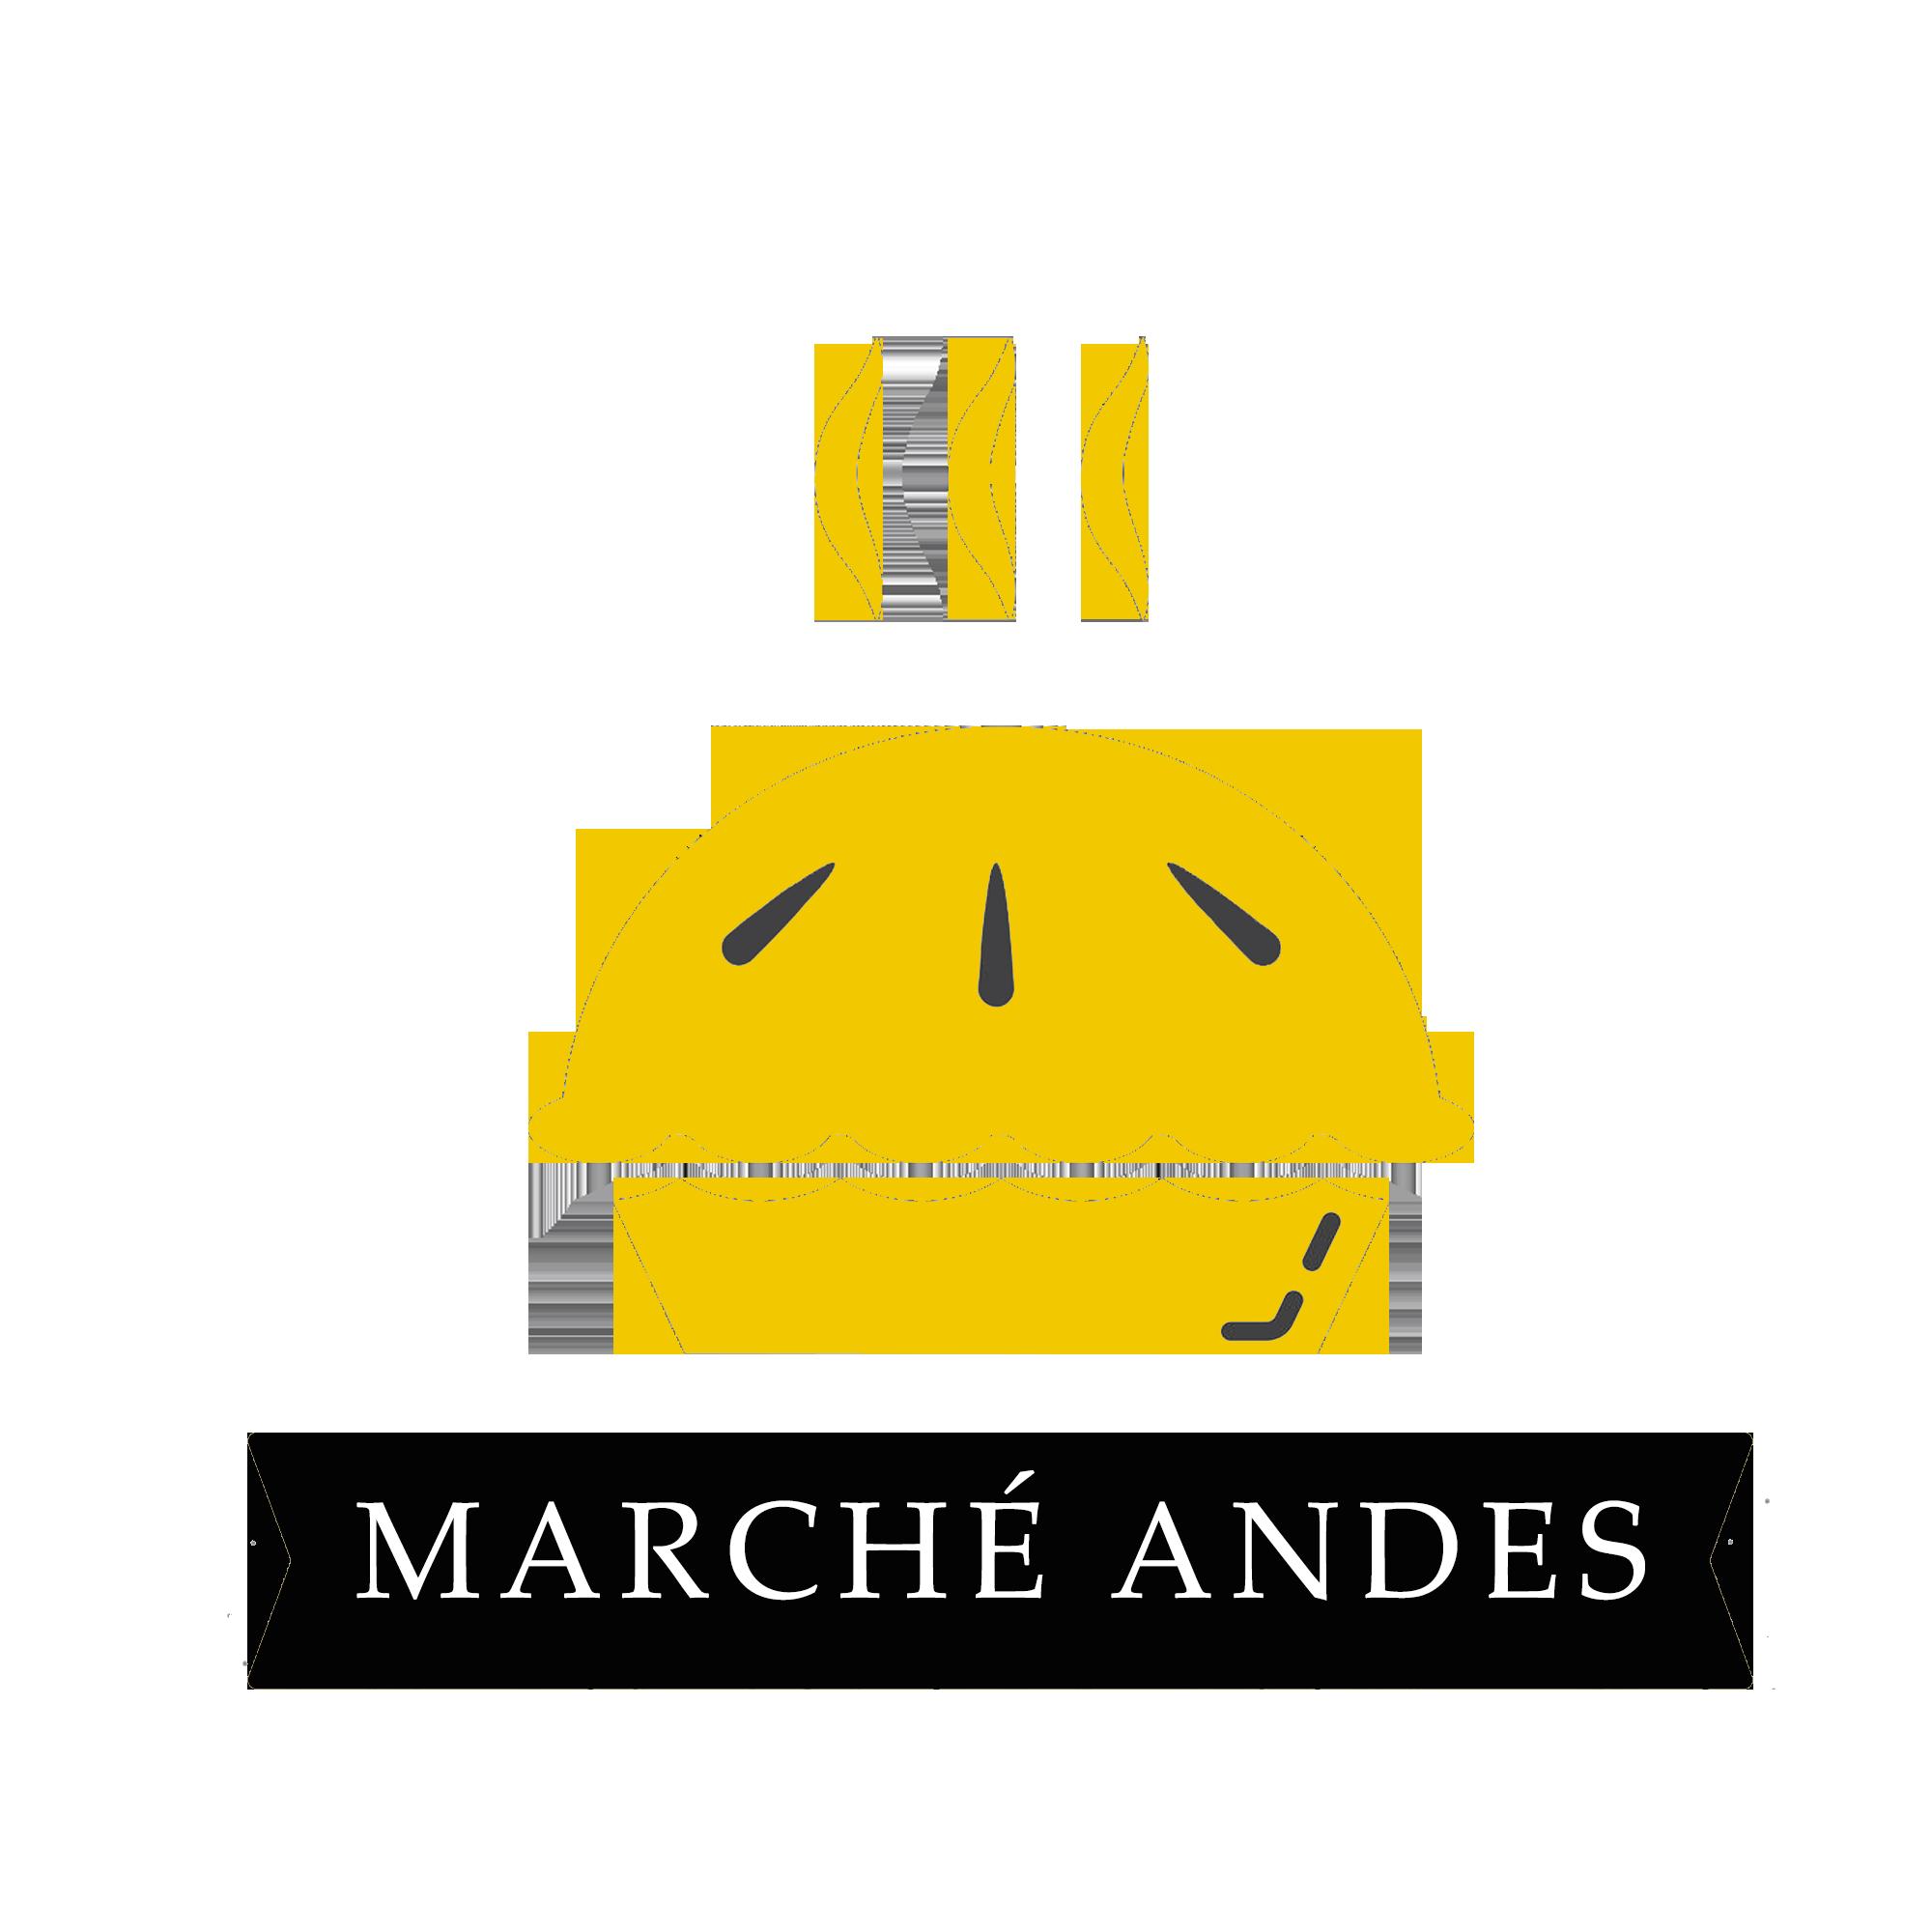 Panaderia Marche Andes